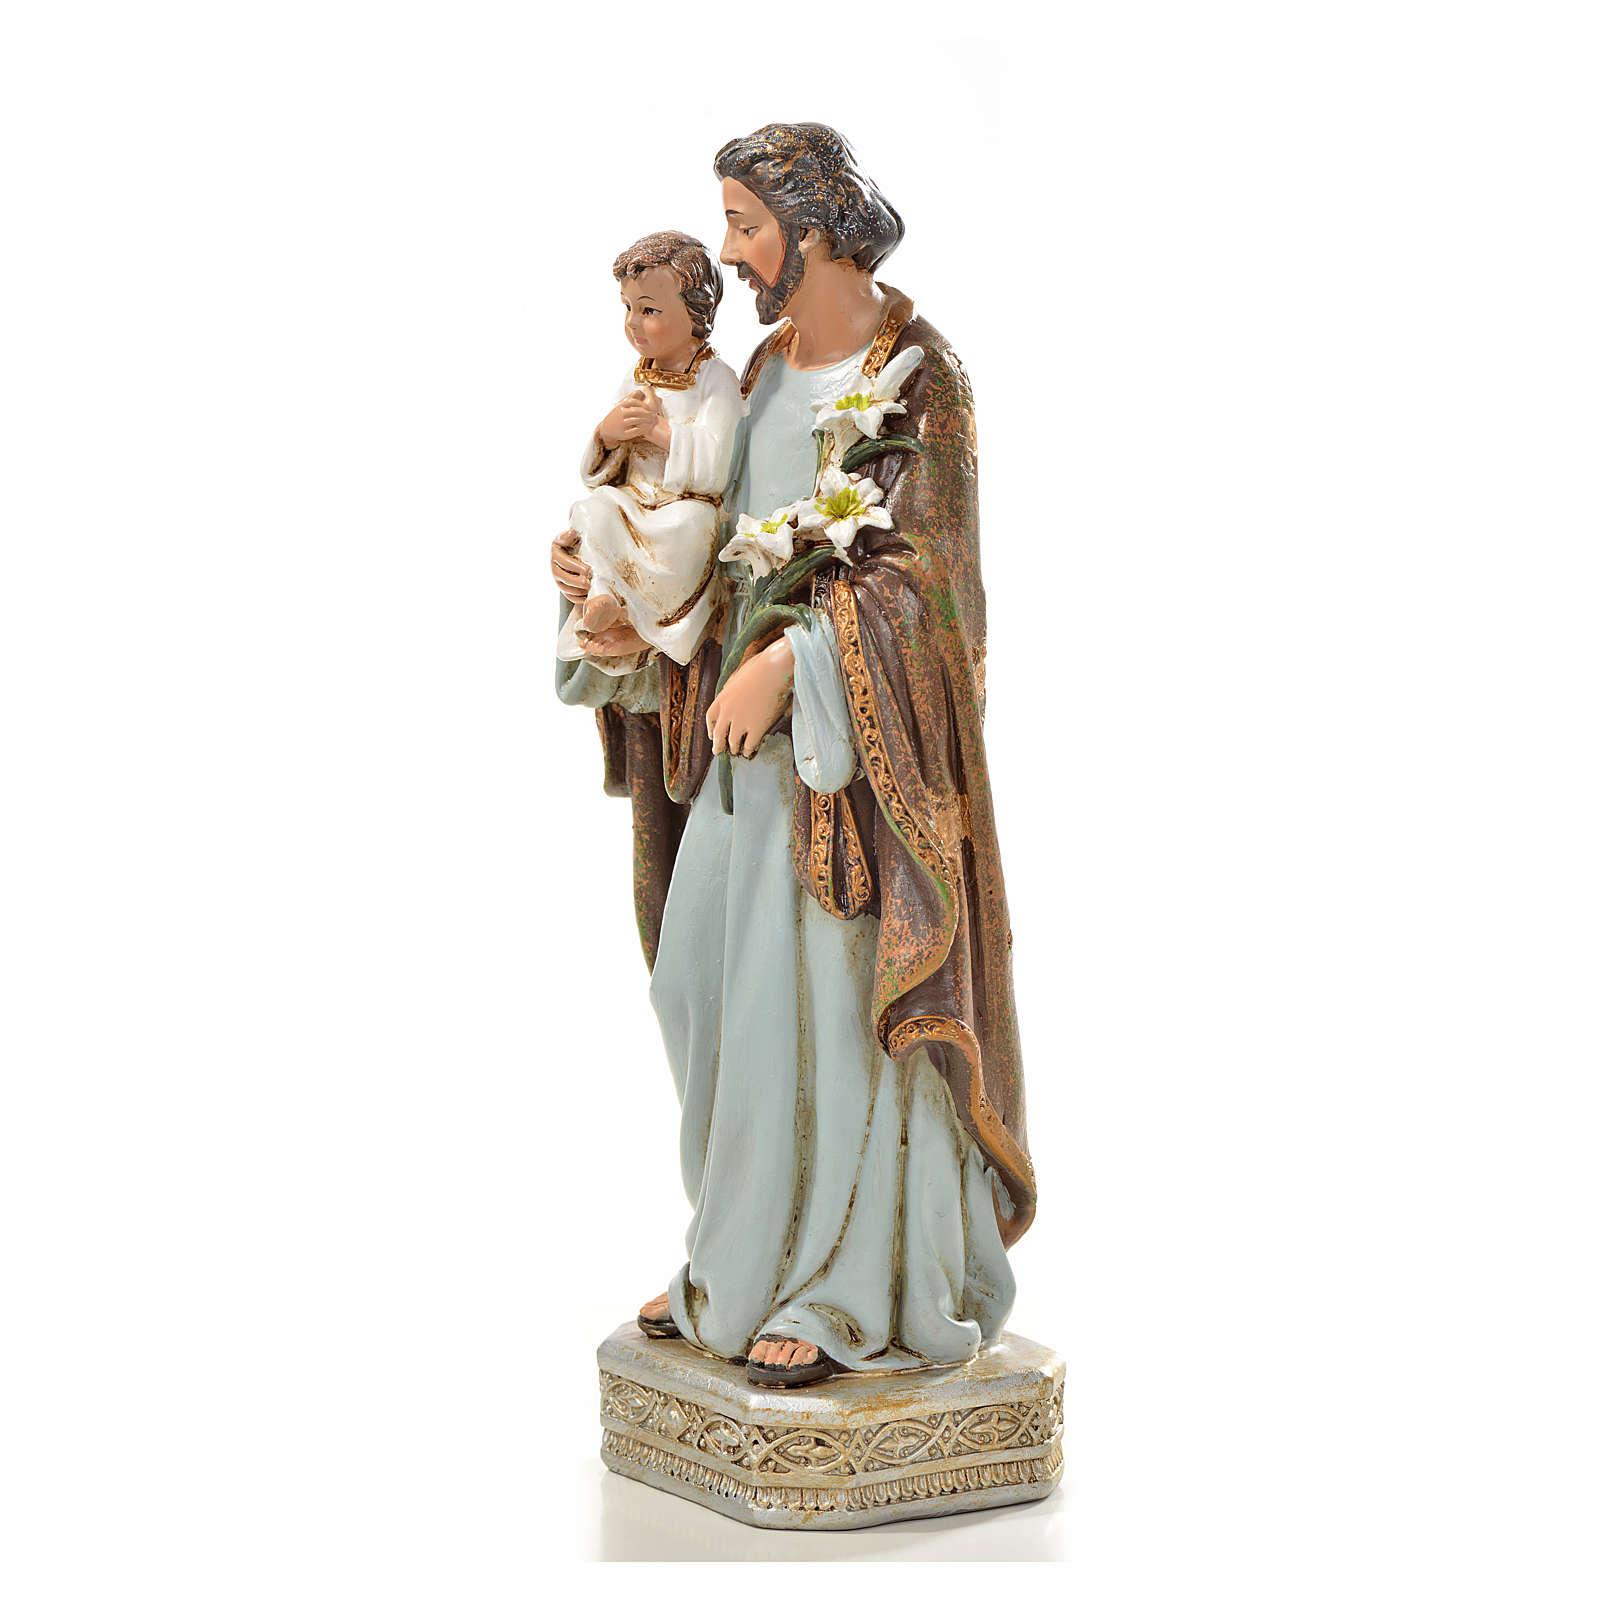 Saint Joseph with baby in resin, 20cmSaint Joseph with baby sta 4